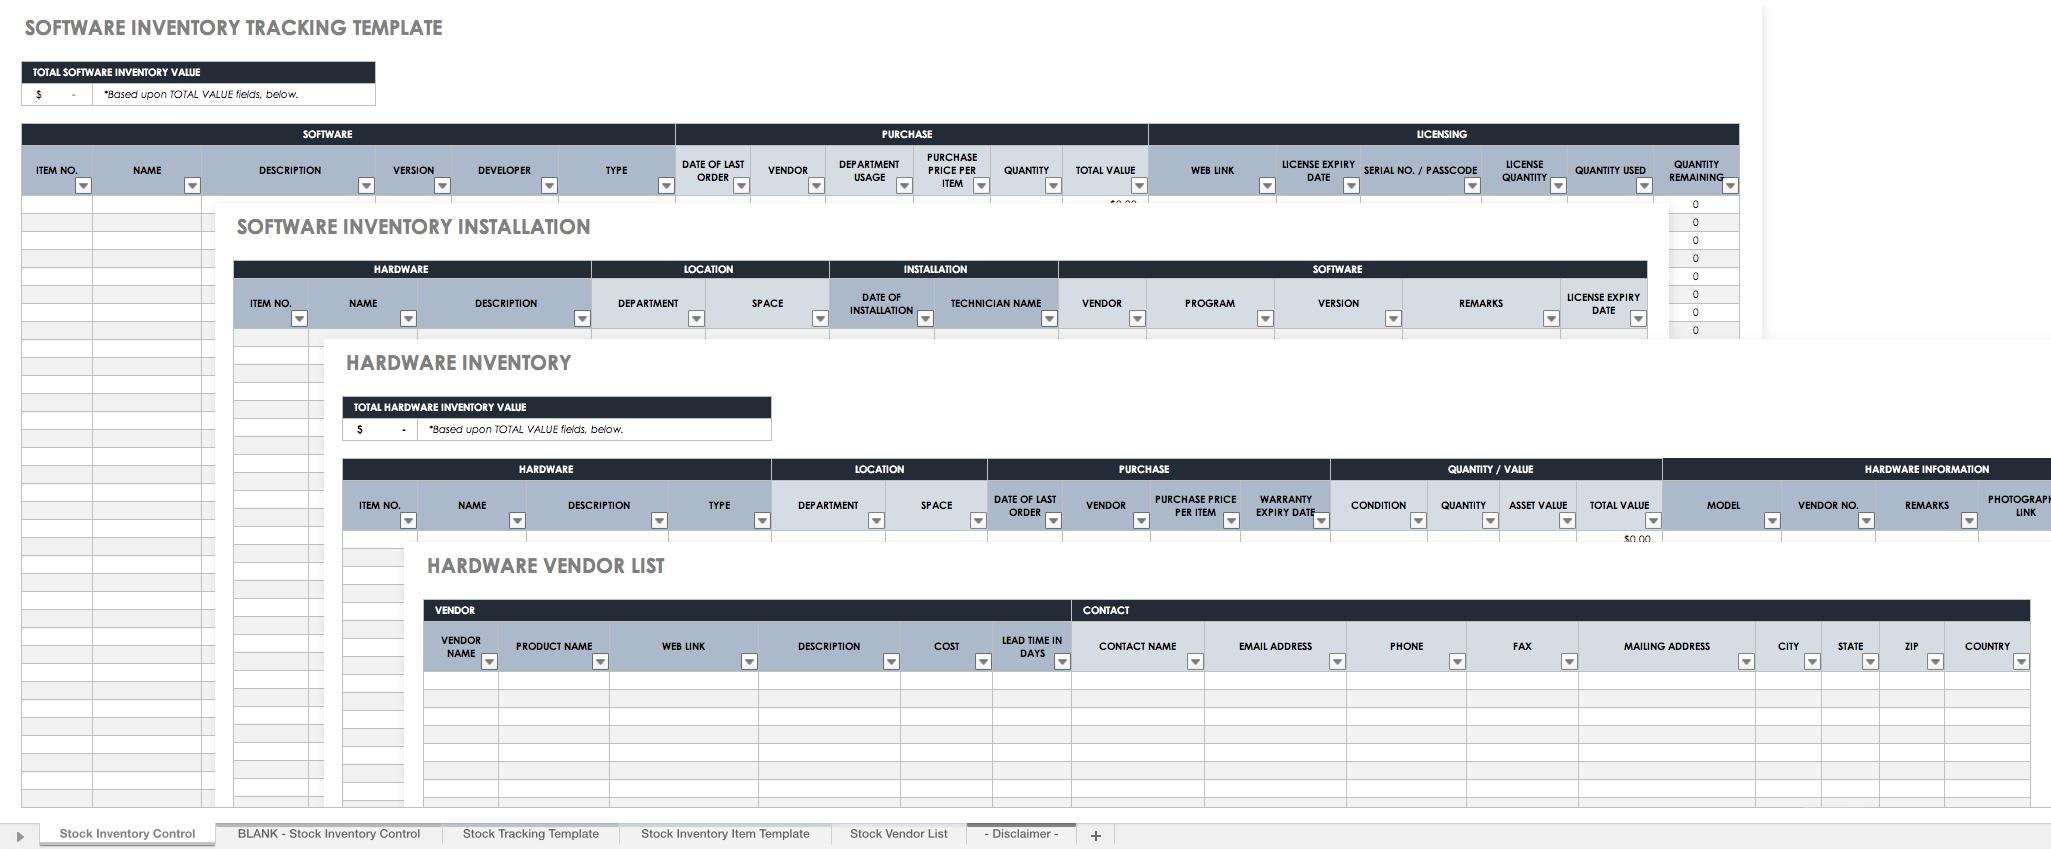 Tracking Spreadsheet Inventory Tracking Spreadsheet